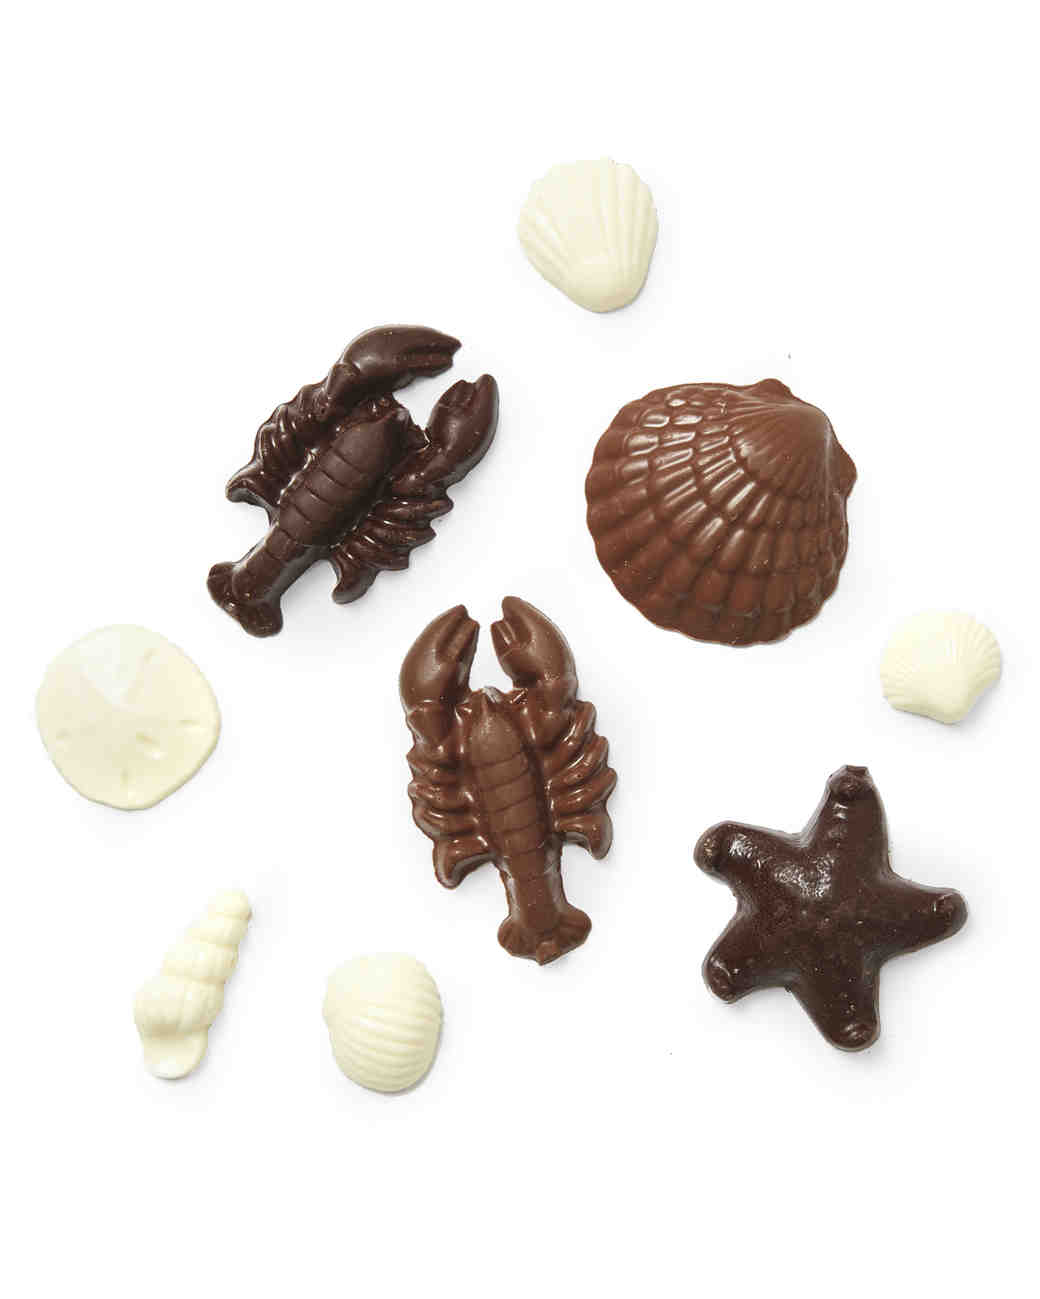 travel-chocolates-802-d111967.jpg